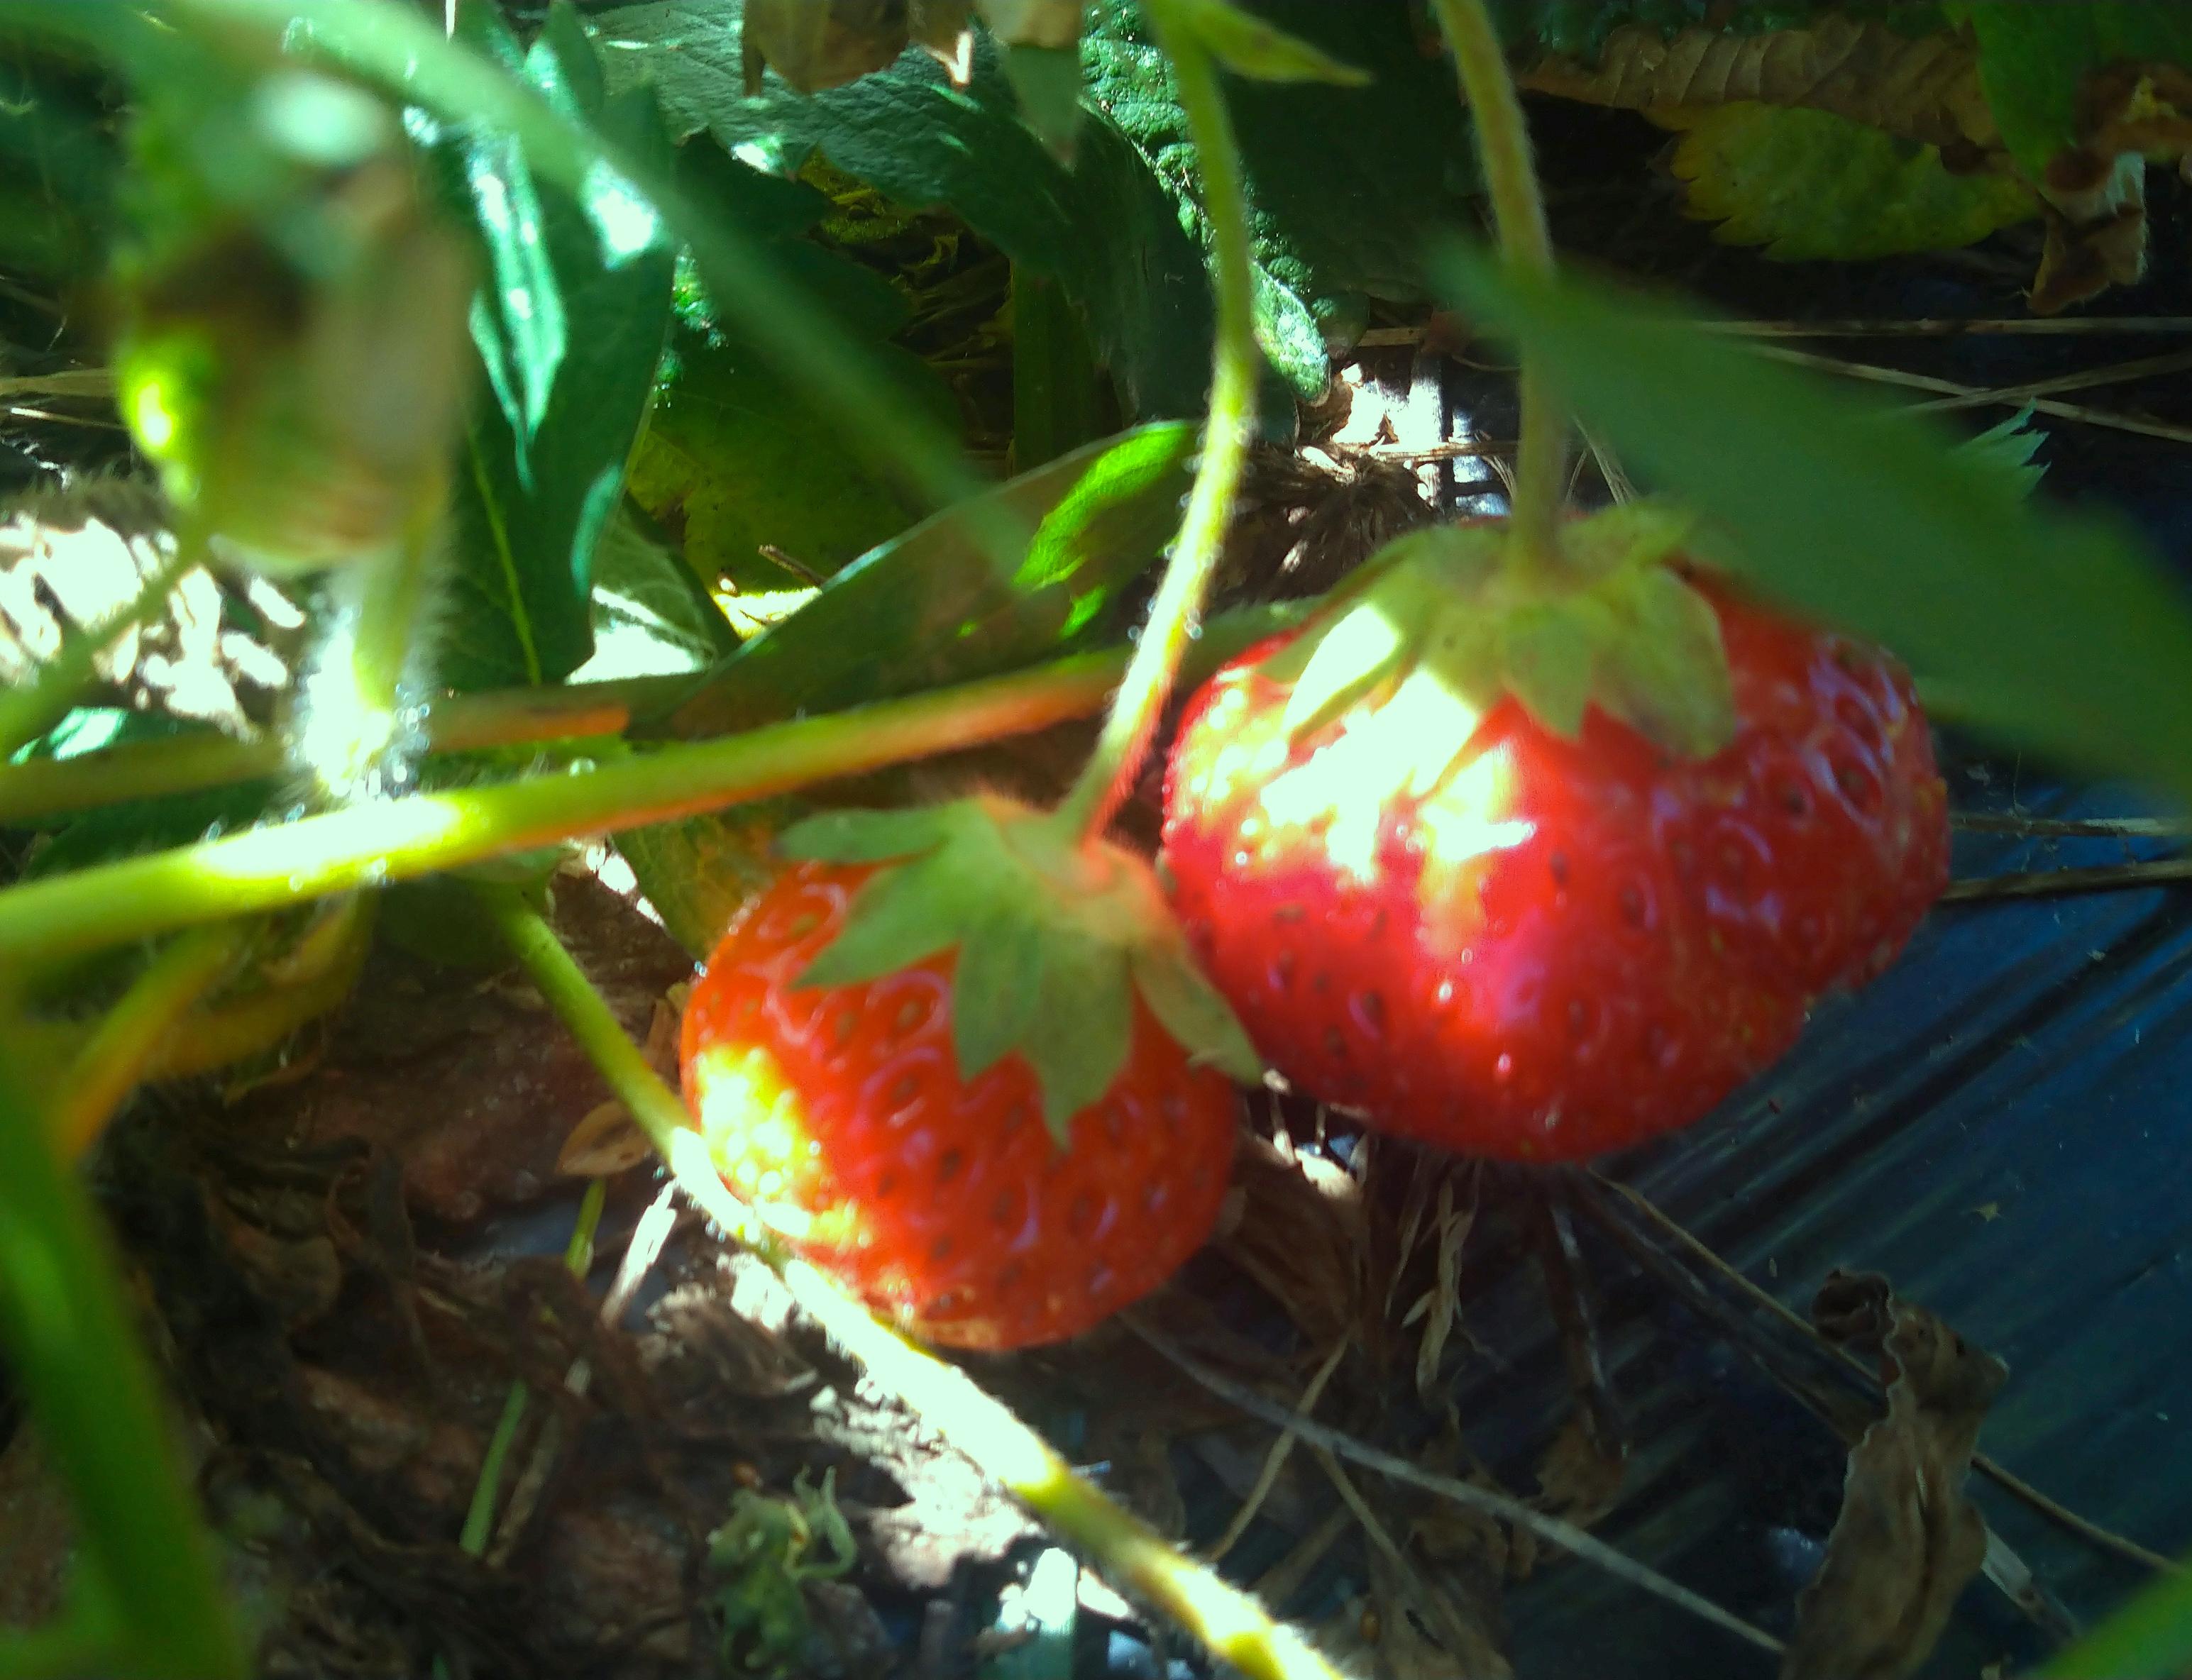 Happy pair of strawberries